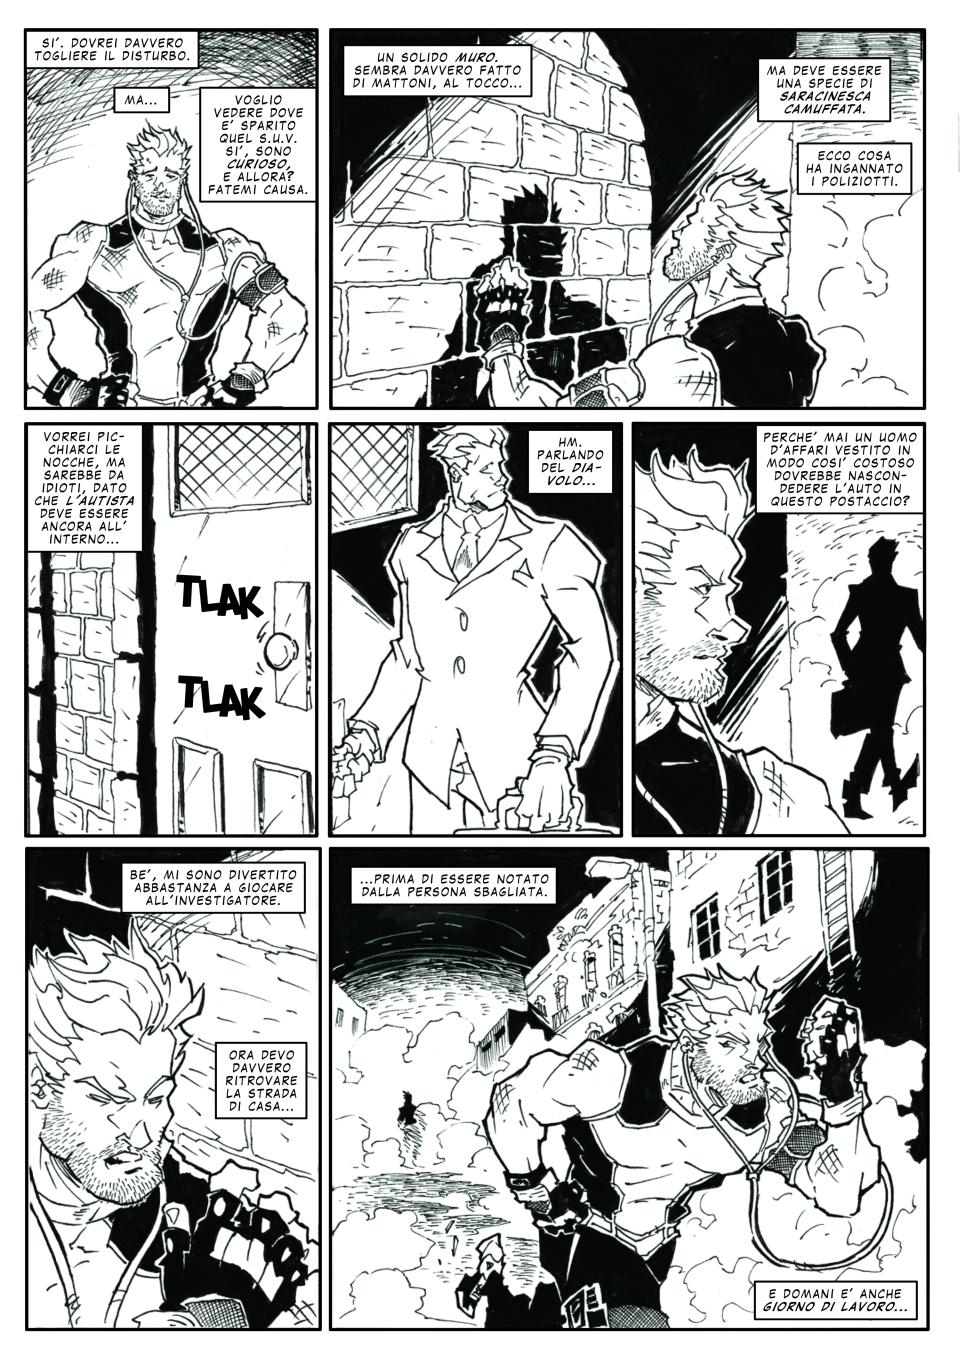 Karnifex - Giustizia - pagina 2 by M3Gr1ml0ck